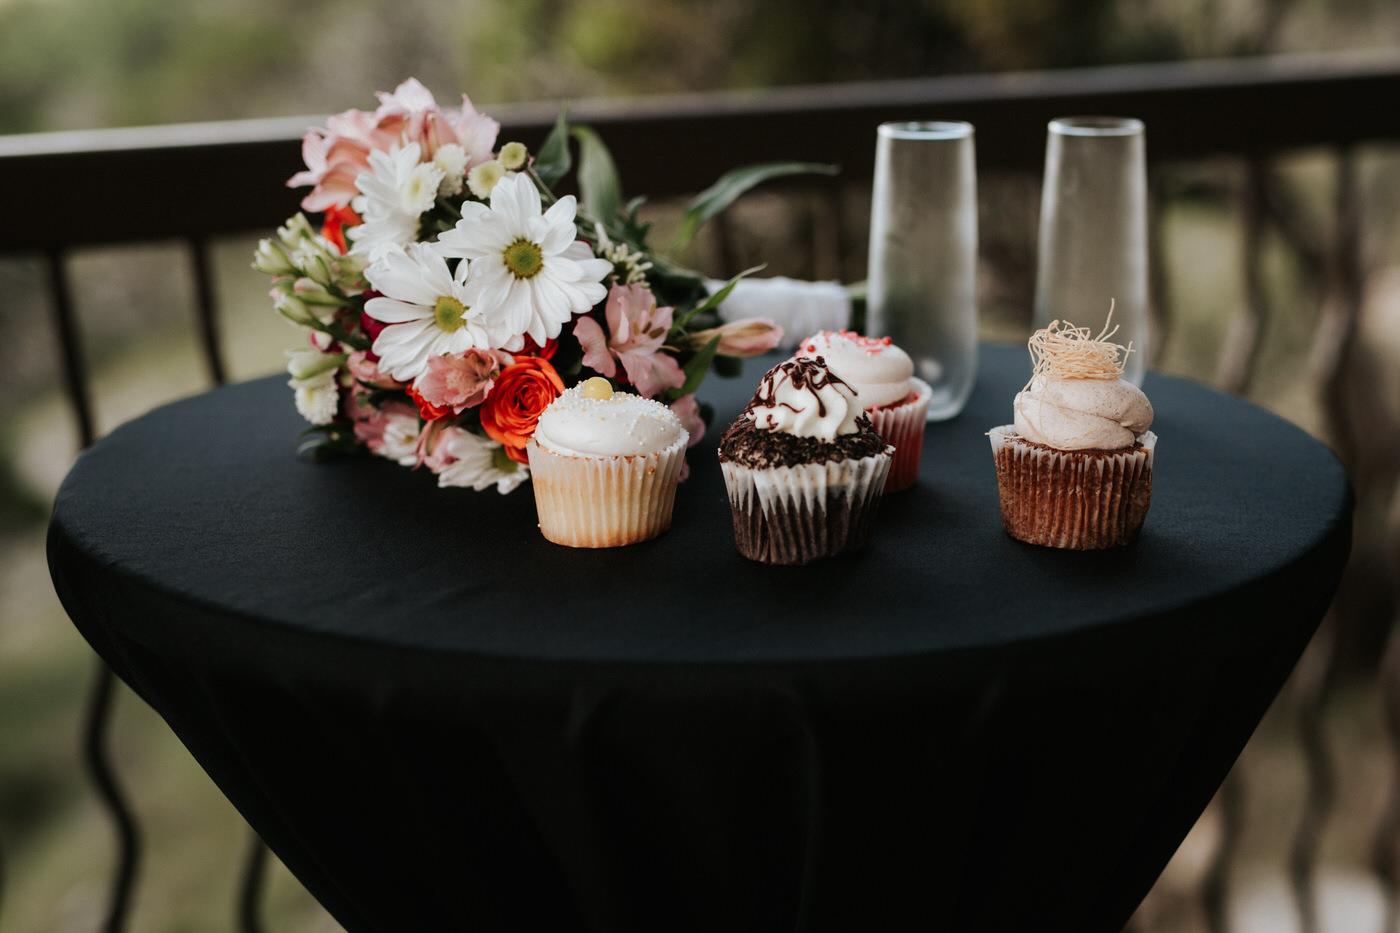 Cupcakes at Chapel Dulcinea wedding